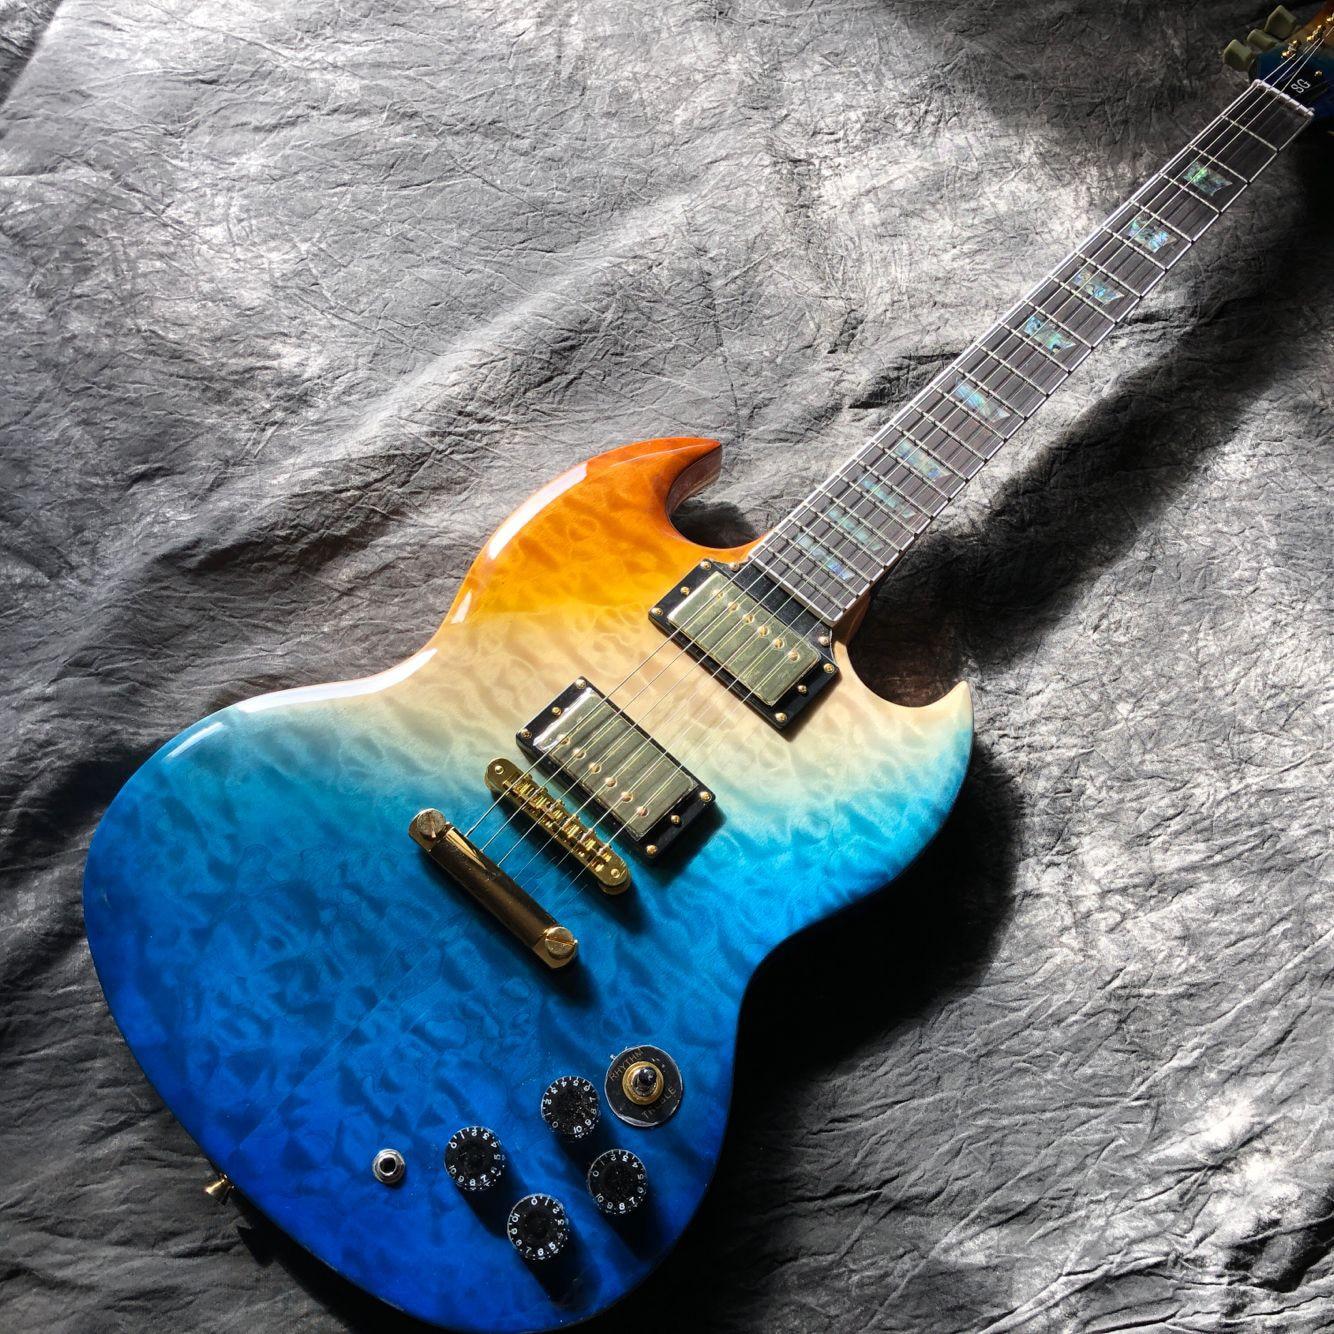 New standard Custom.Flame top electric guitar.Rosewood fingerboard gitaar,Golden hardware.handwork 6 Strings guitarra.